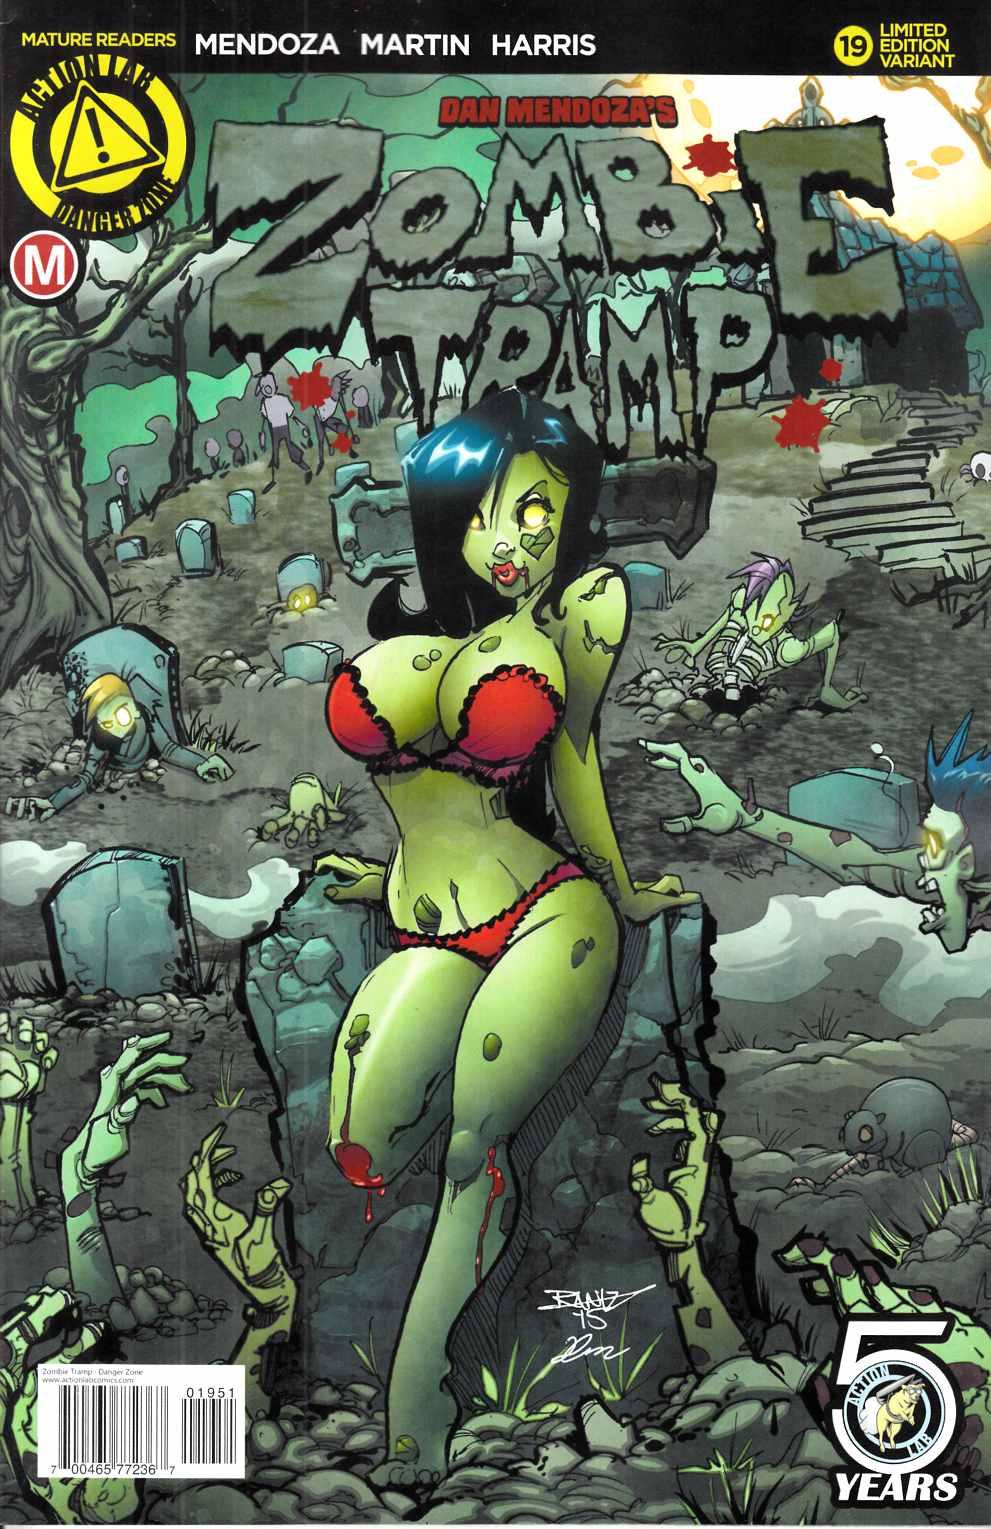 порно комикс с зомби № 142510 бесплатно